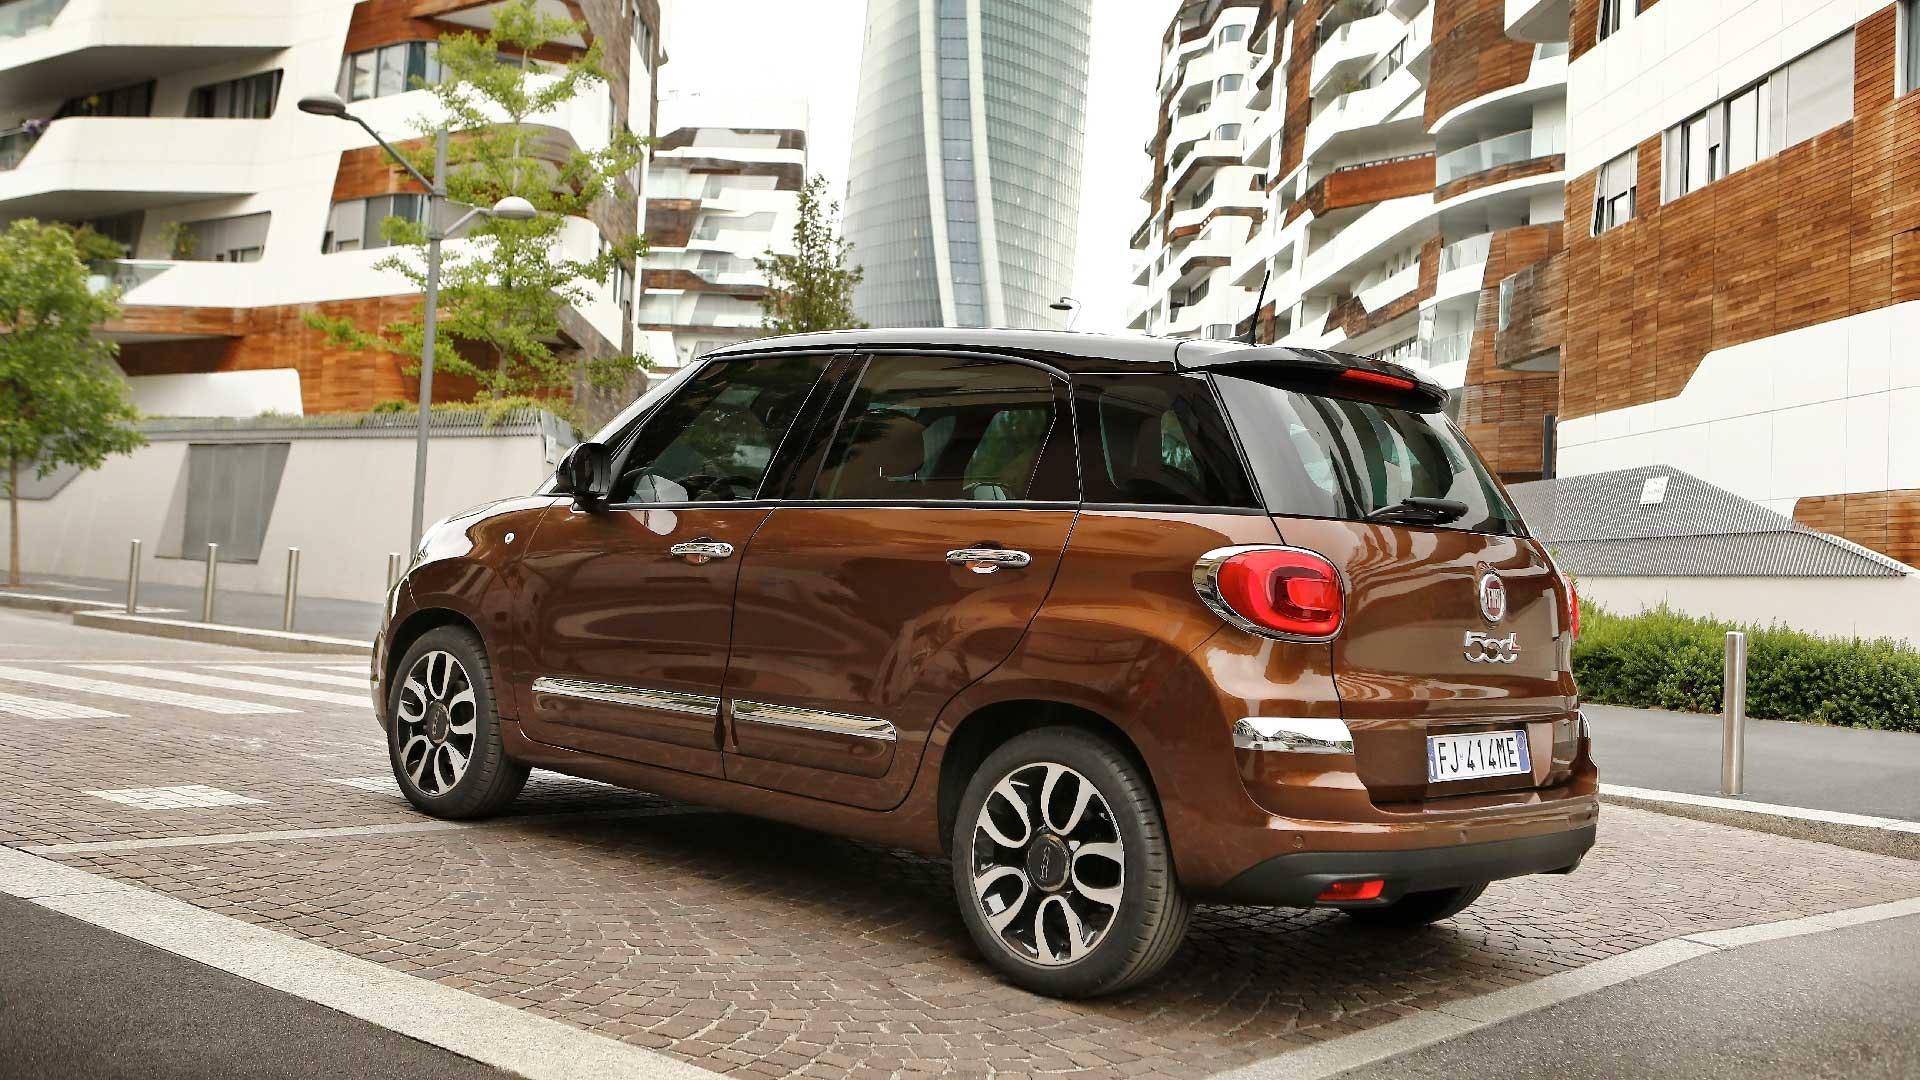 Fiat 500L brun side